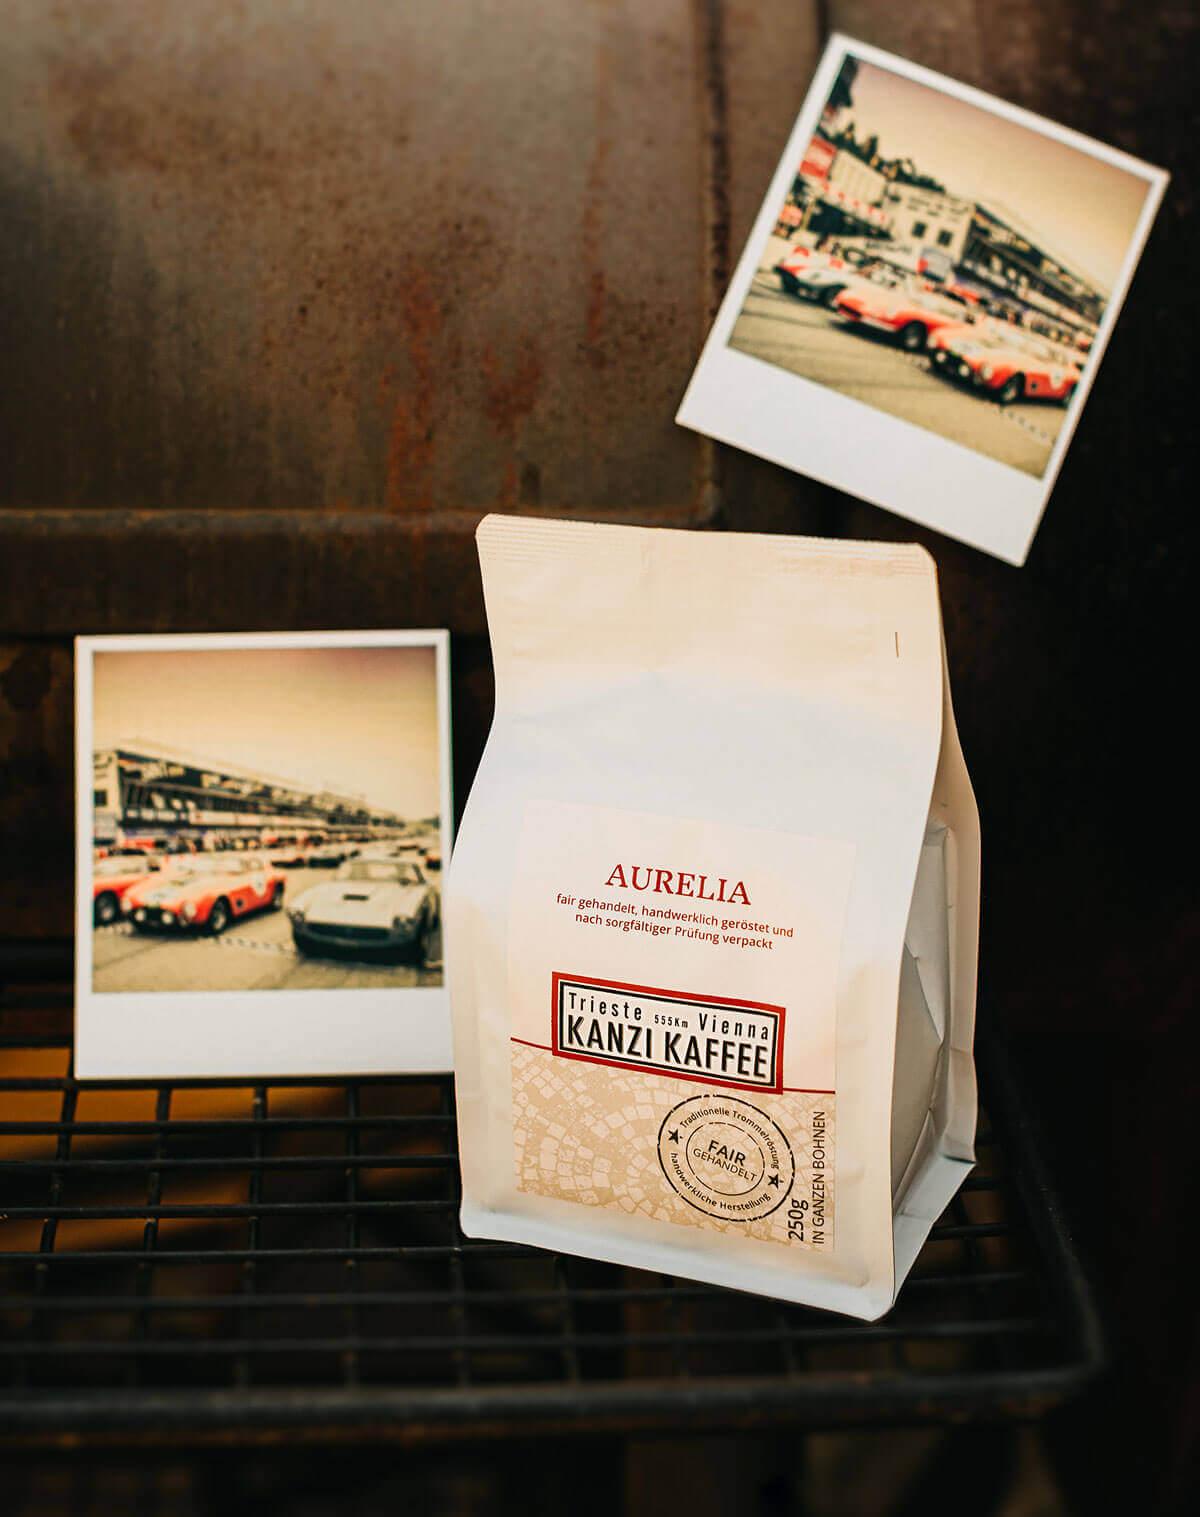 <p style=text-align:center> AURELIA | Unsere KRÄFTIGE Kaffeeröstung</p>